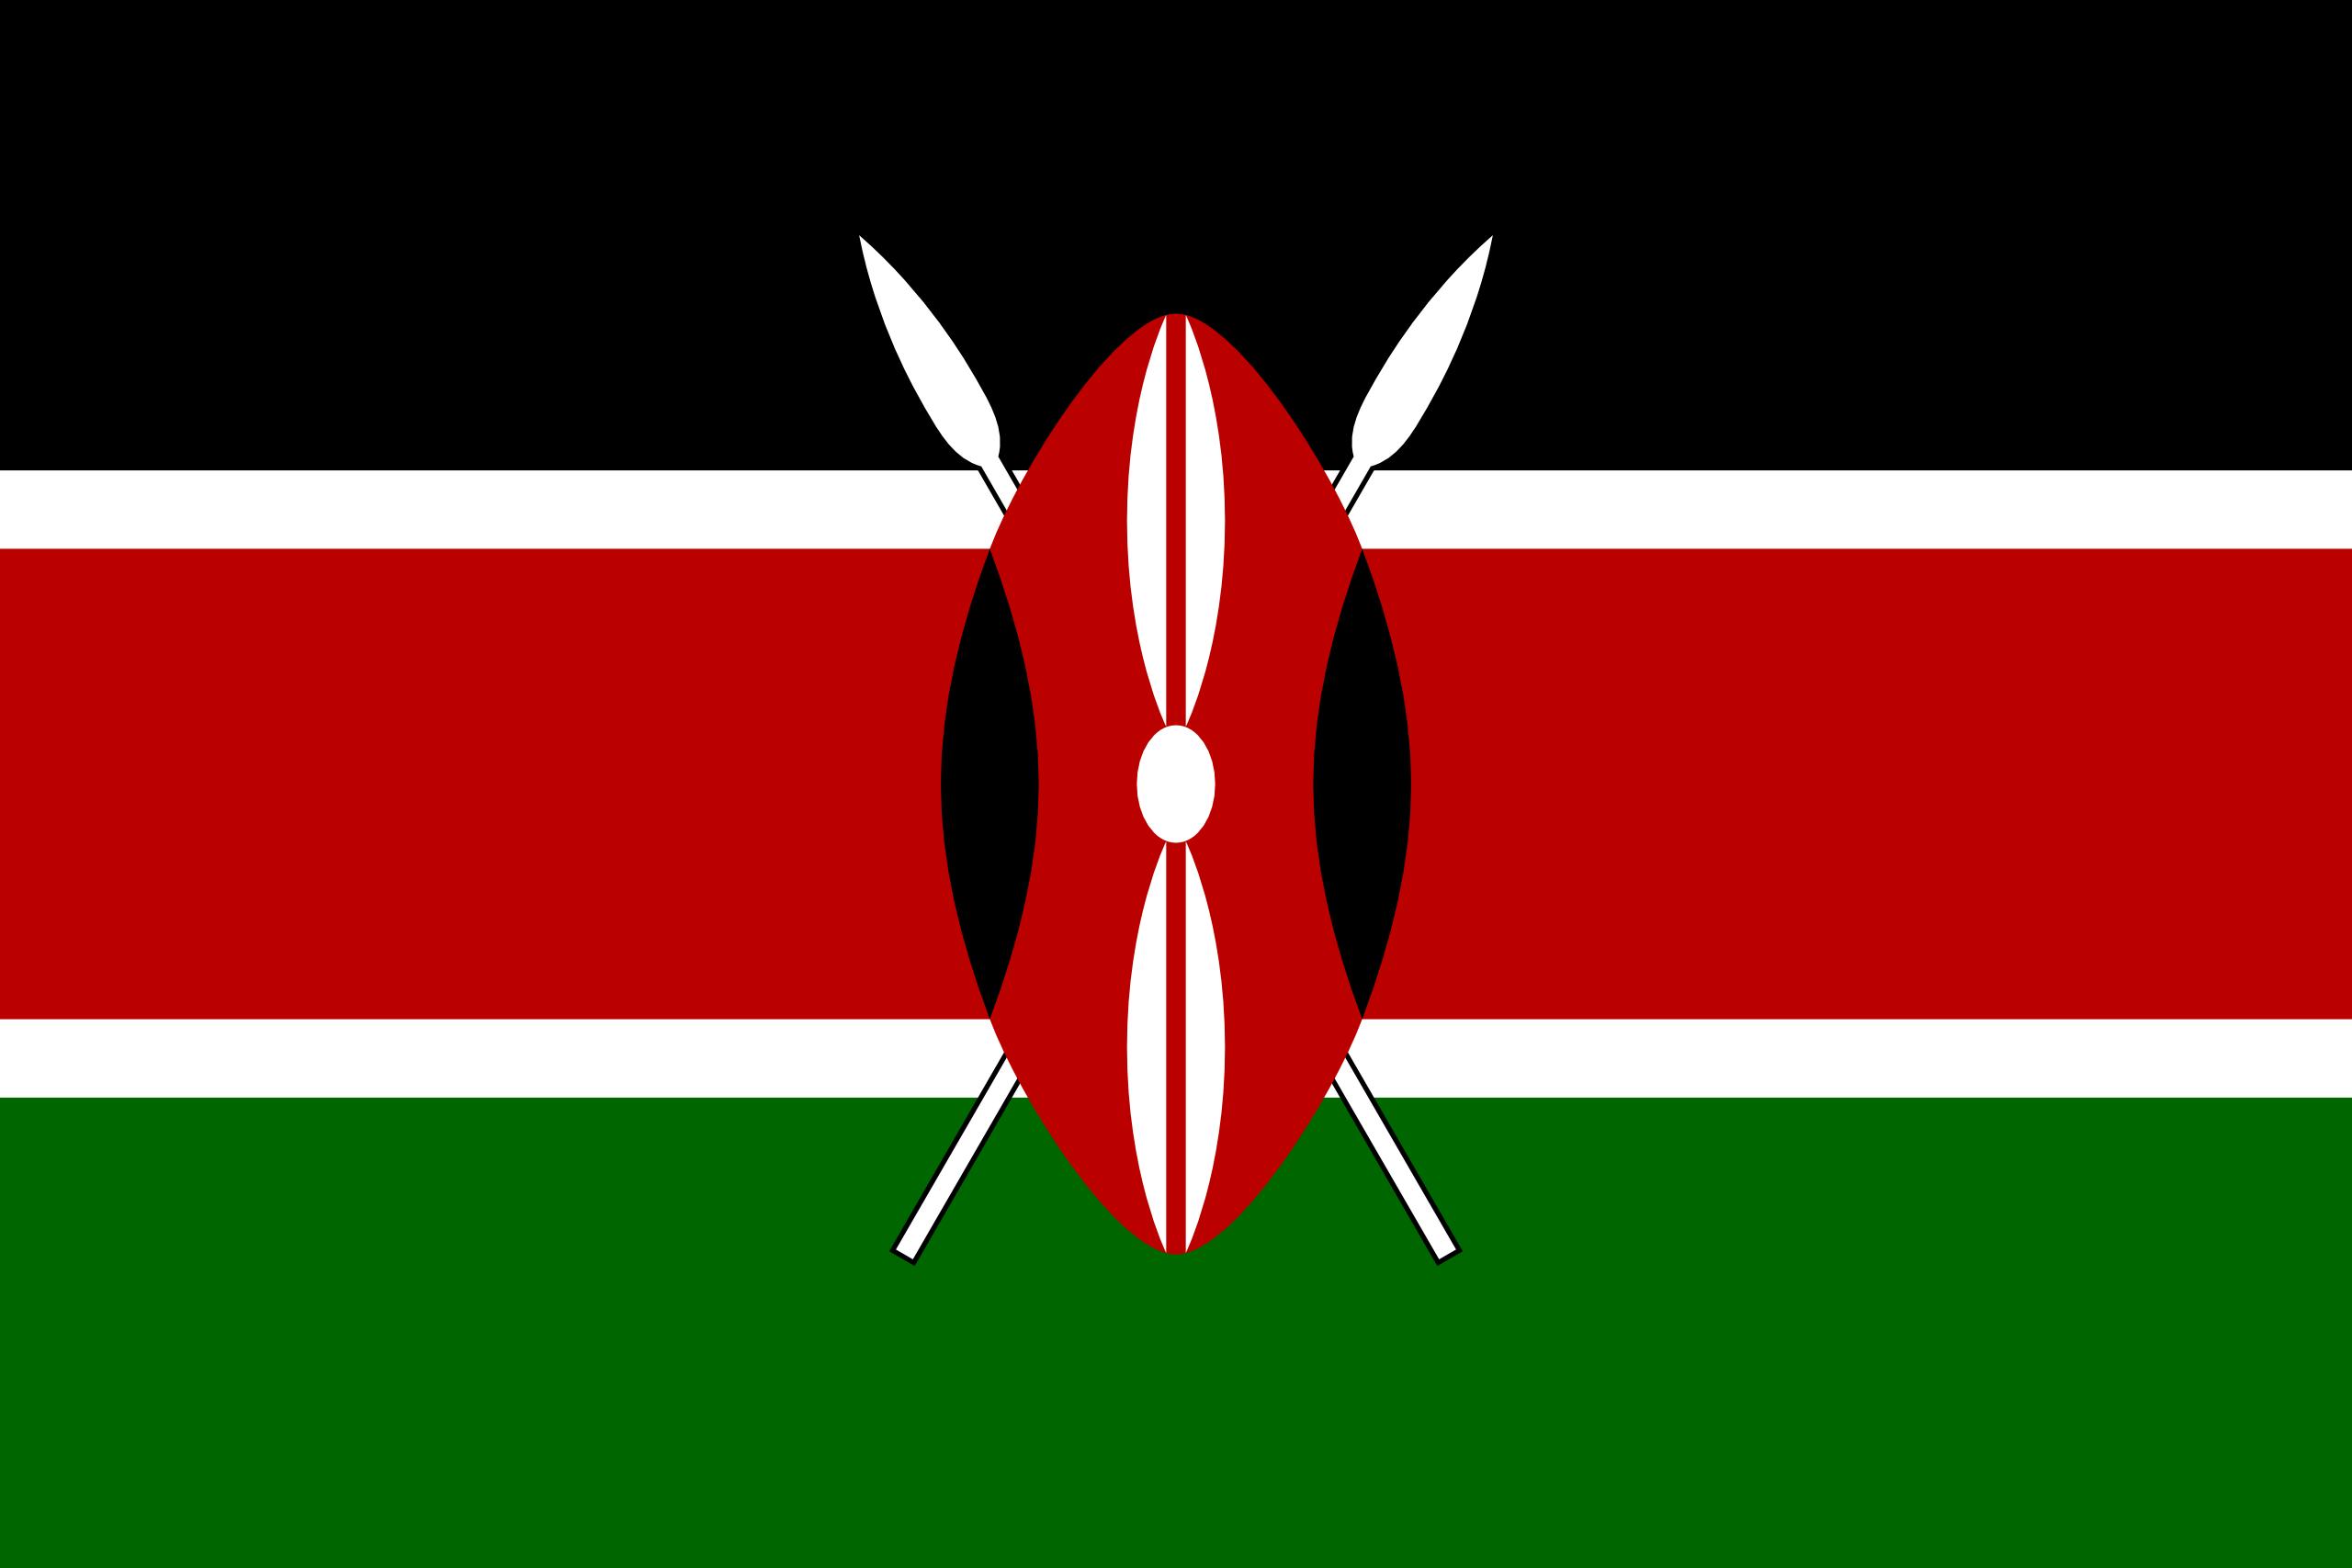 kenia, país, emblema, insignia, σύμβολο - Wallpapers HD - Professor-falken.com